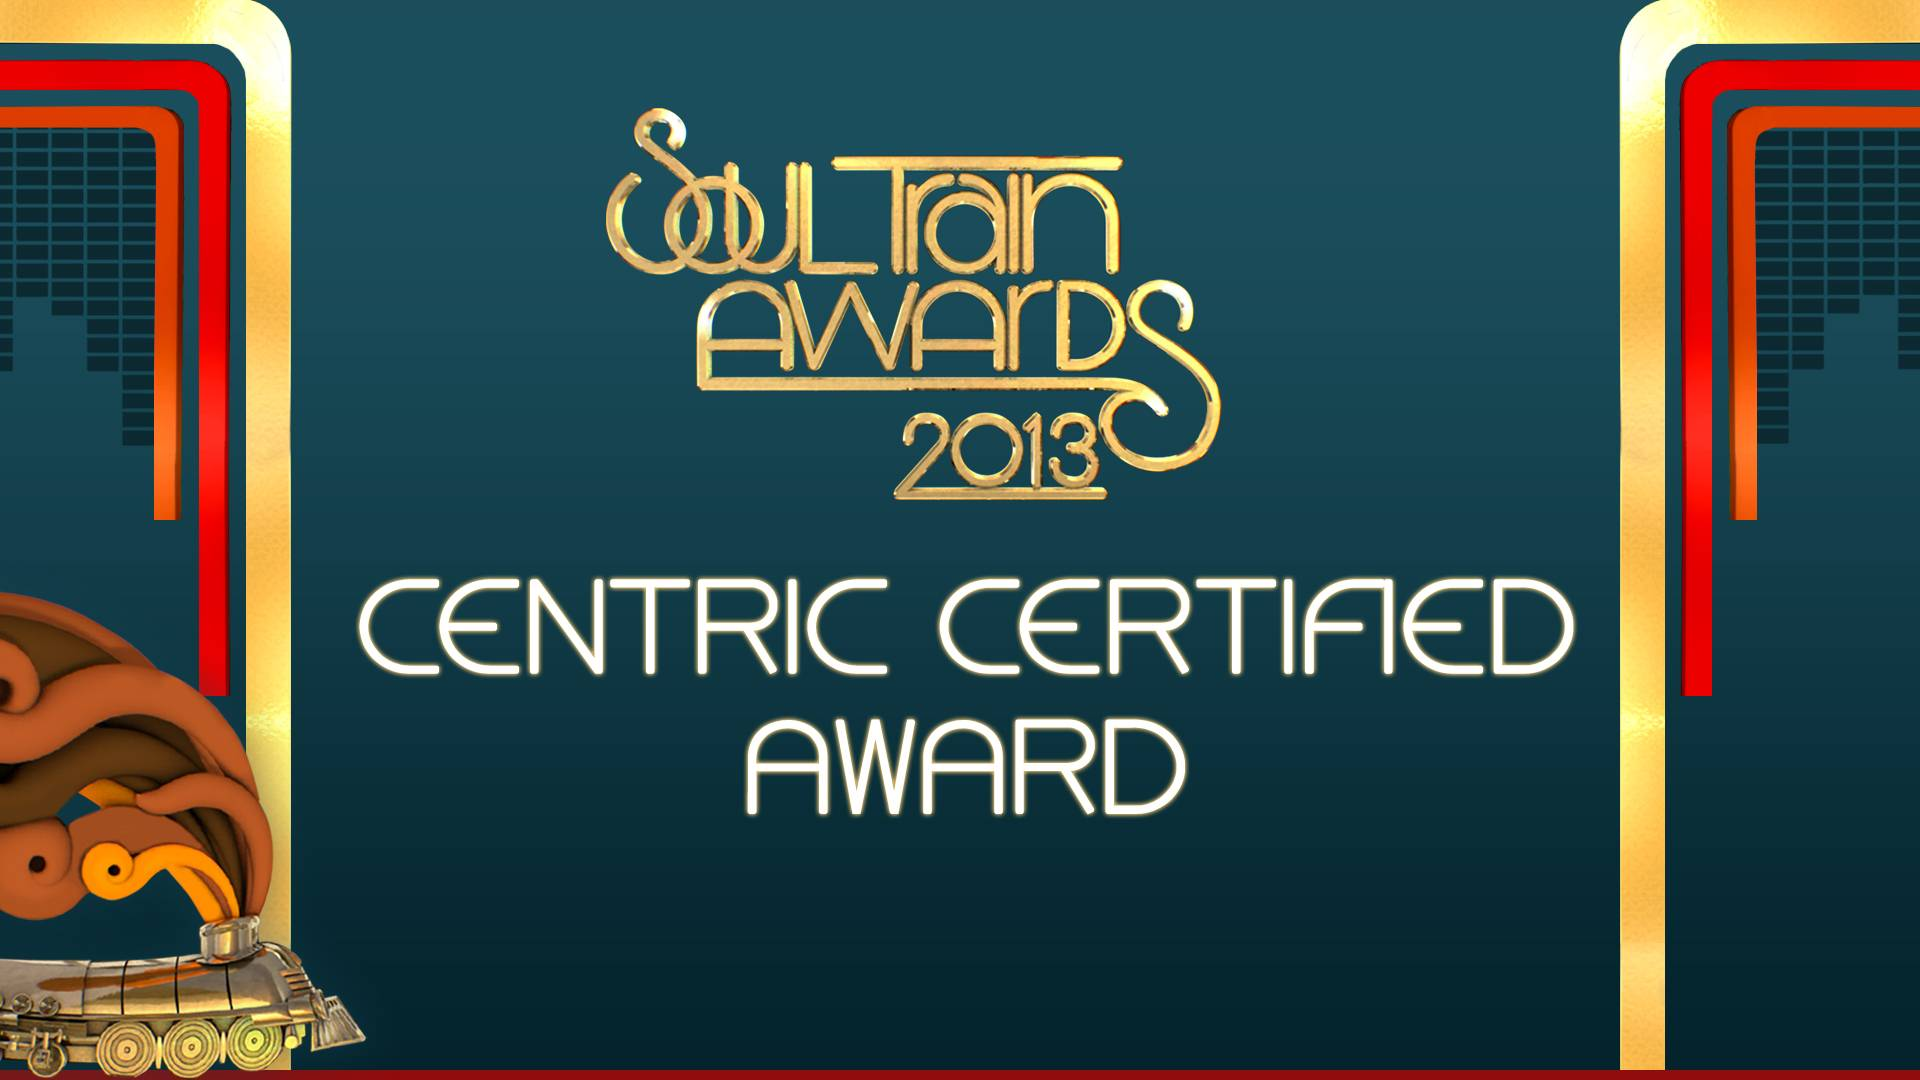 Centric Certified Award